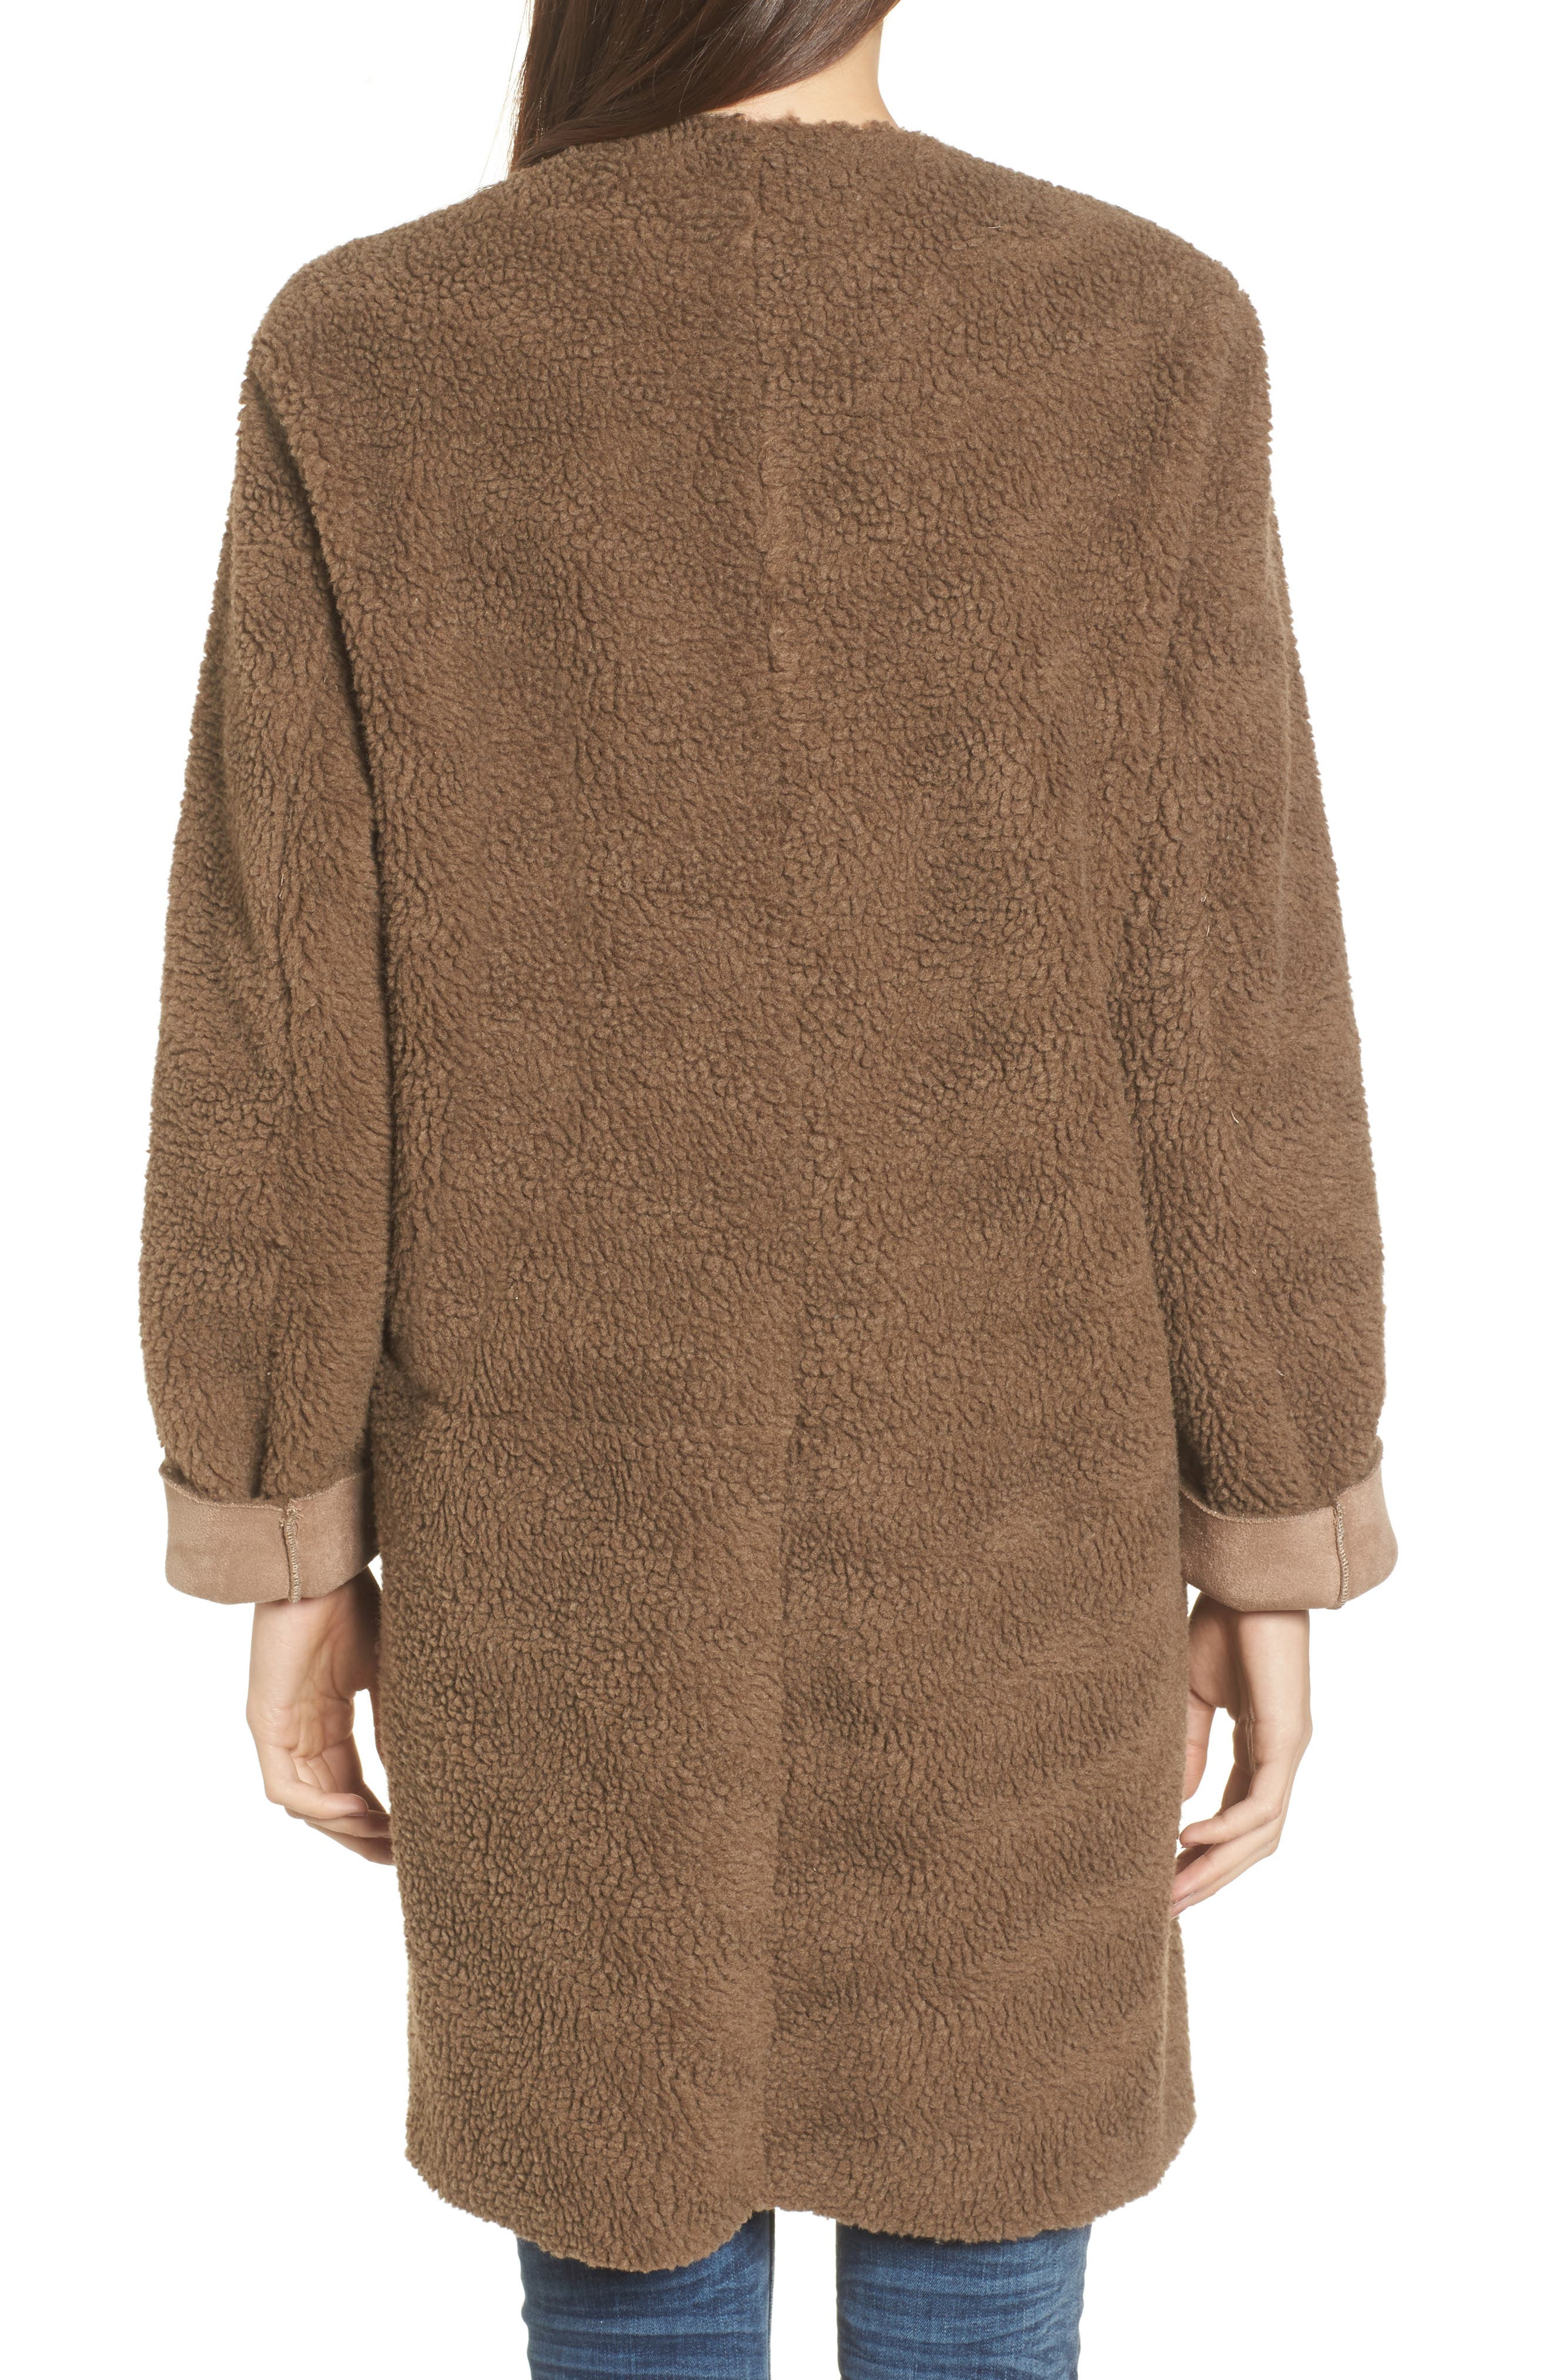 Reversible Fleece Jacket,                             Alternate thumbnail 2, color,                             239